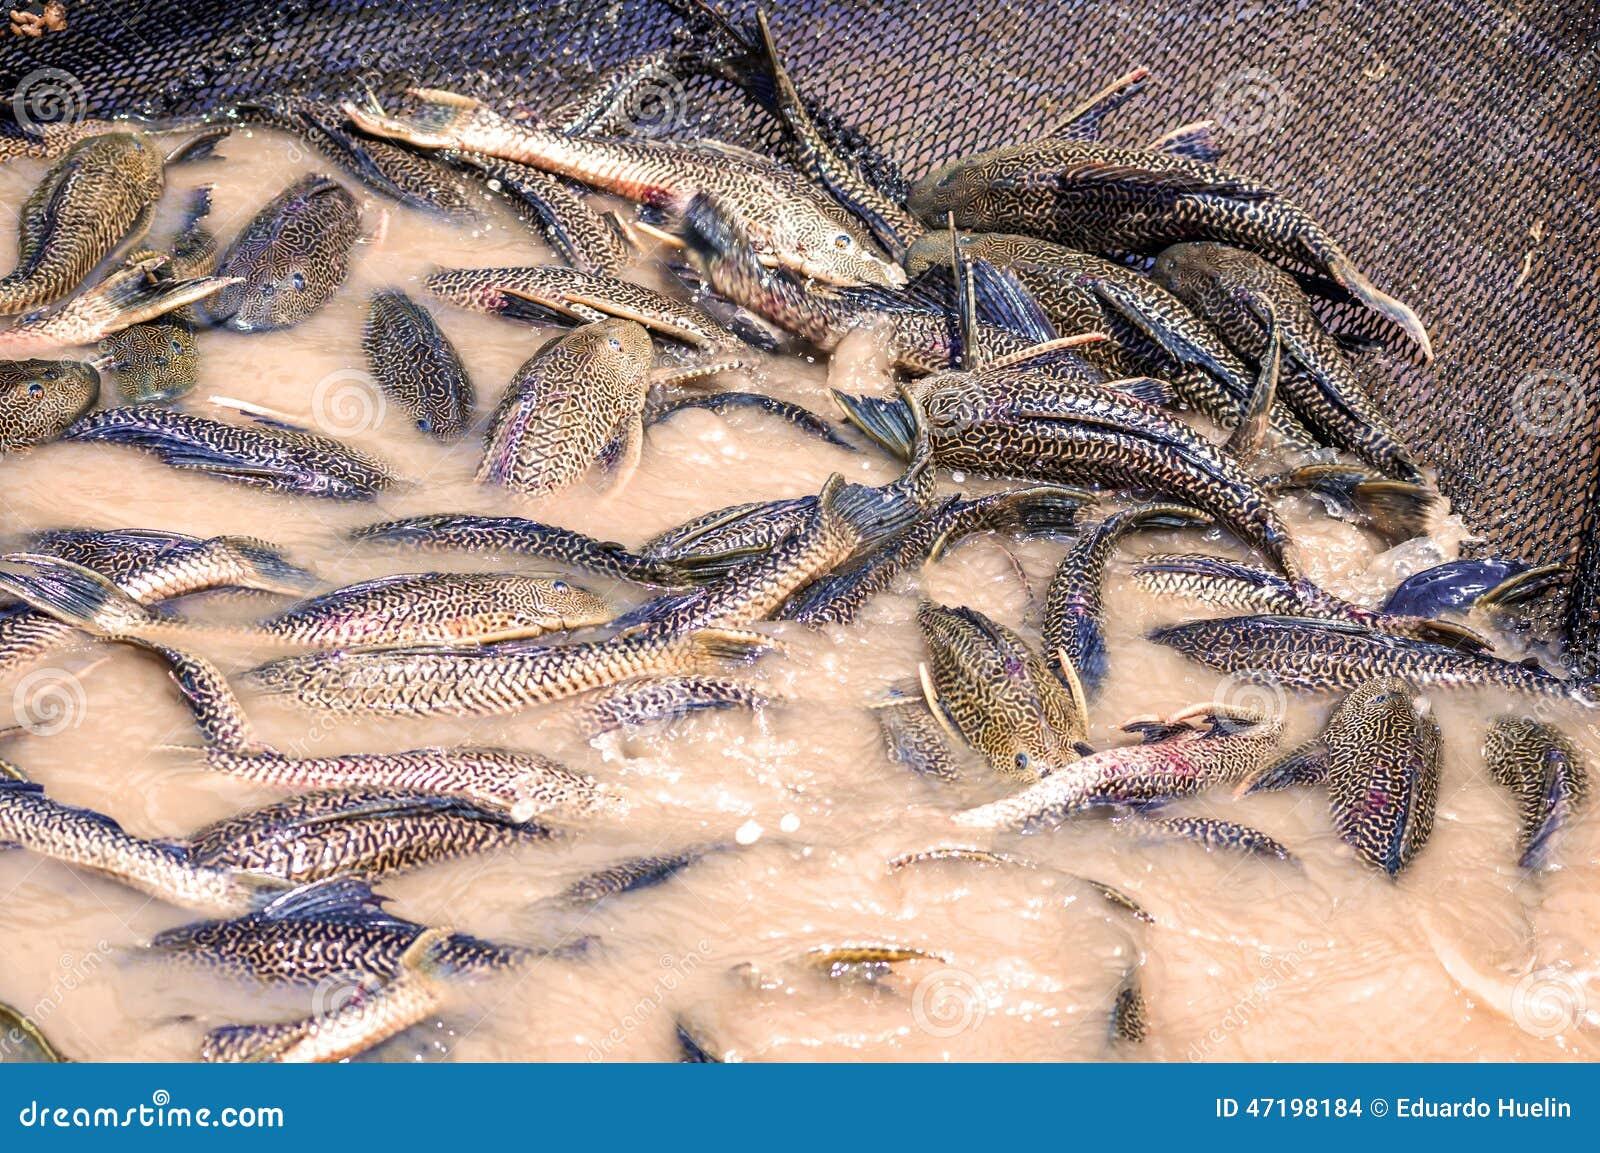 Fishing net full of amazonic fishes in the amazon rain for Amazon fishing net